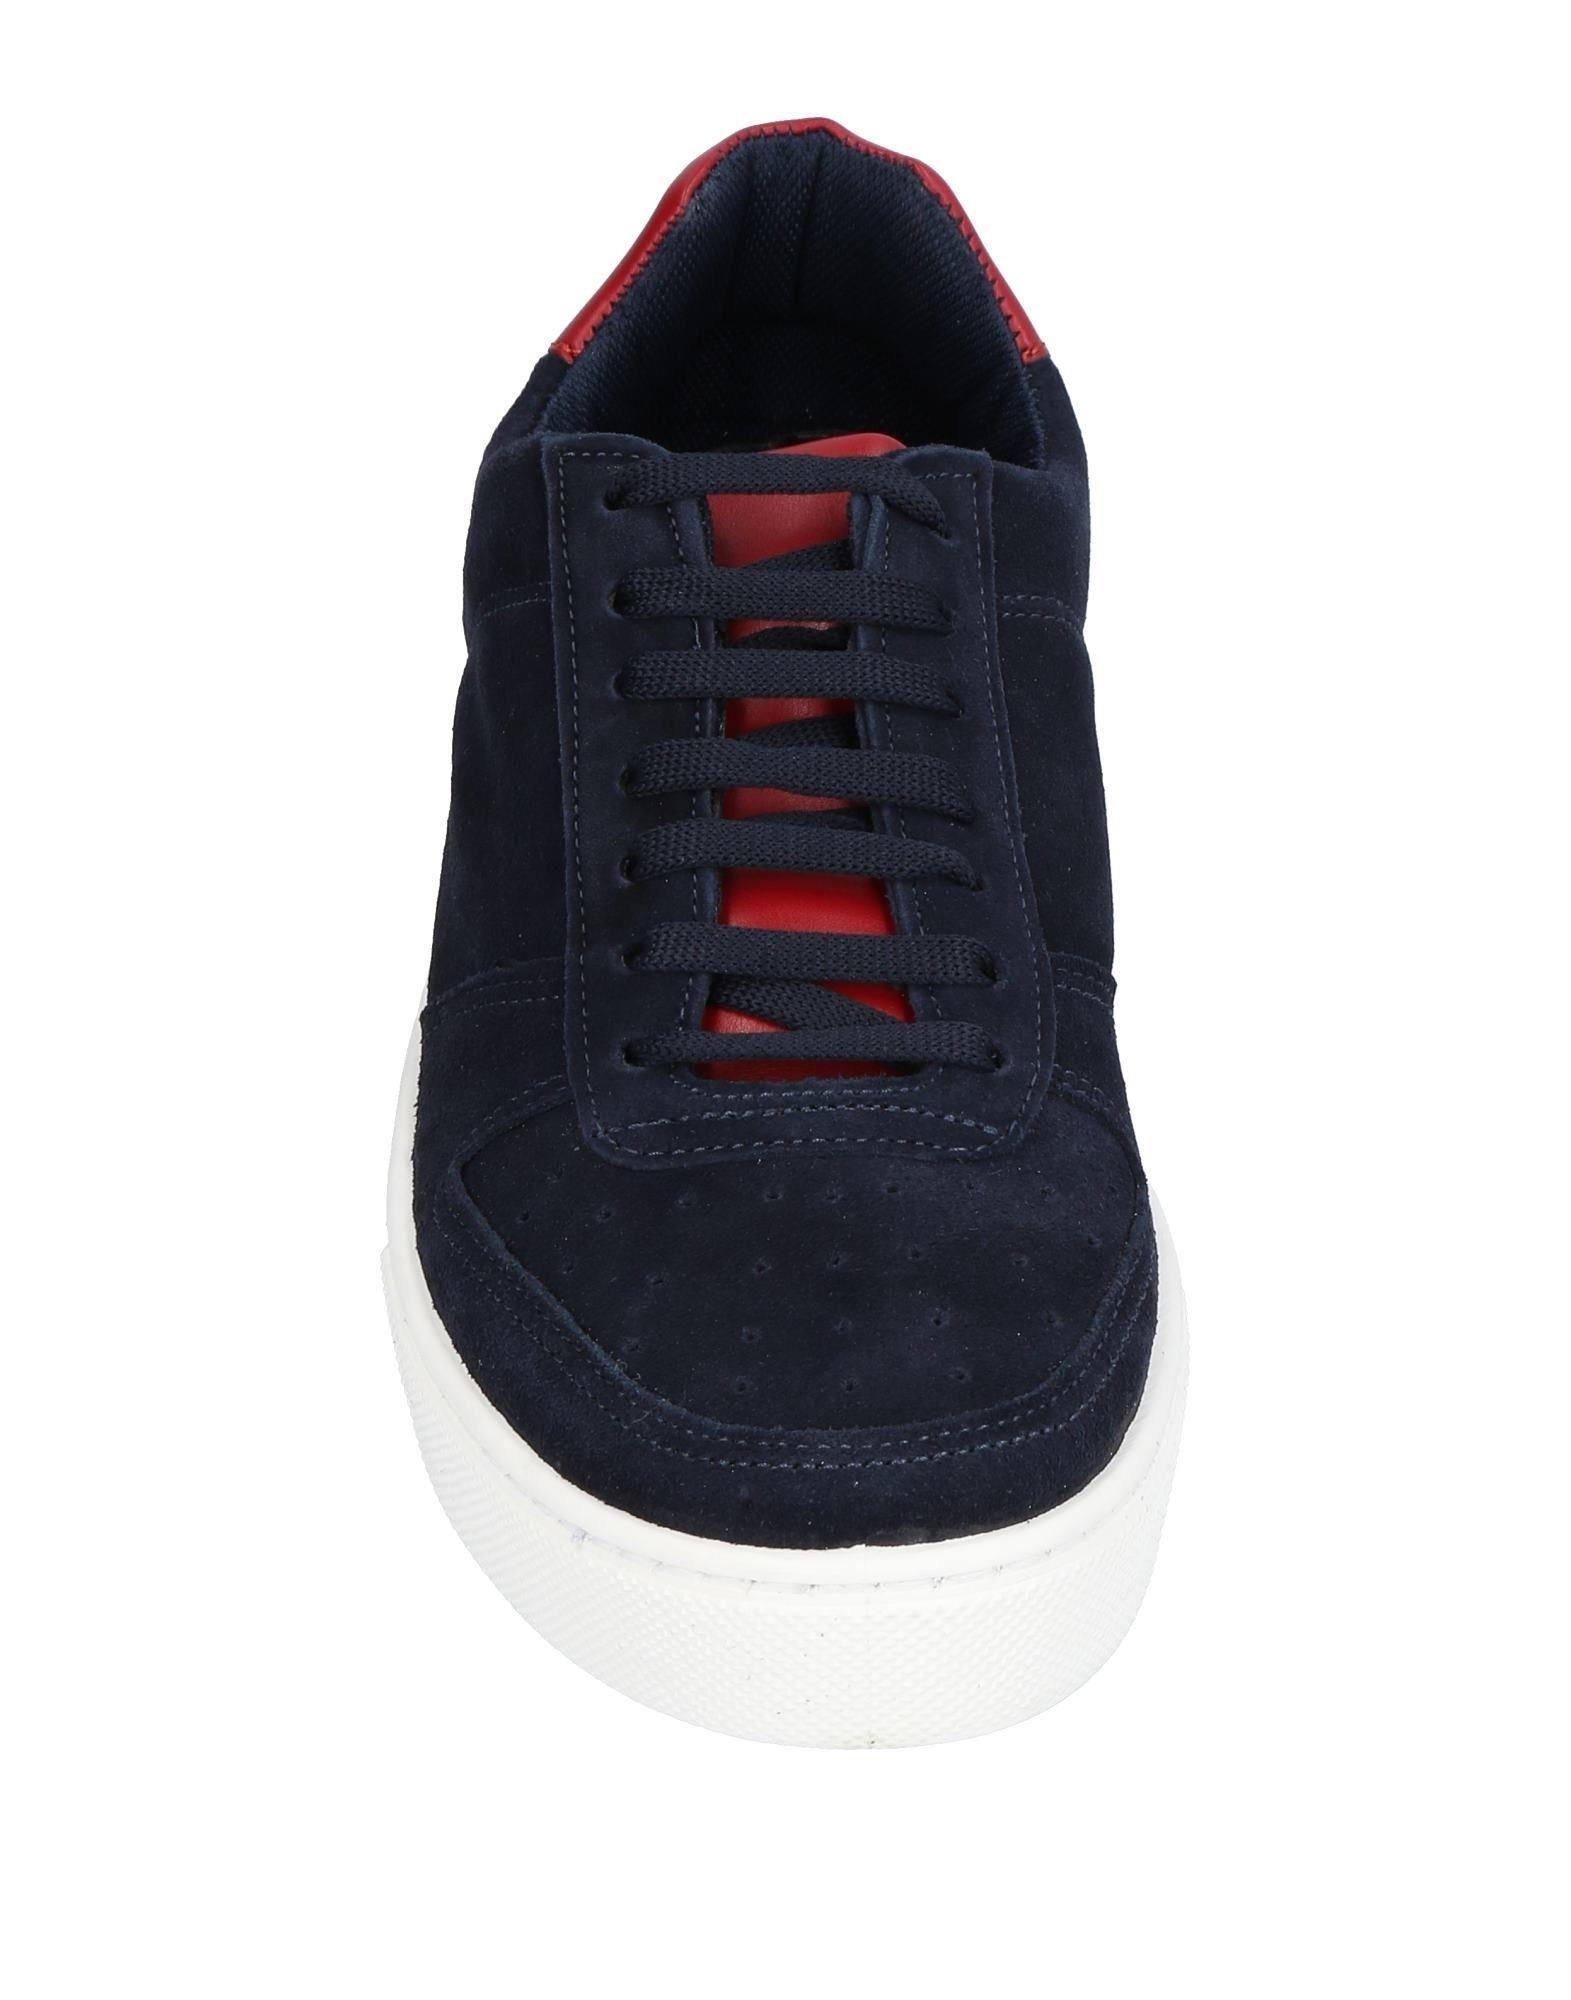 A.Testoni Sneakers Herren    11459059SX Heiße Schuhe e9bac5